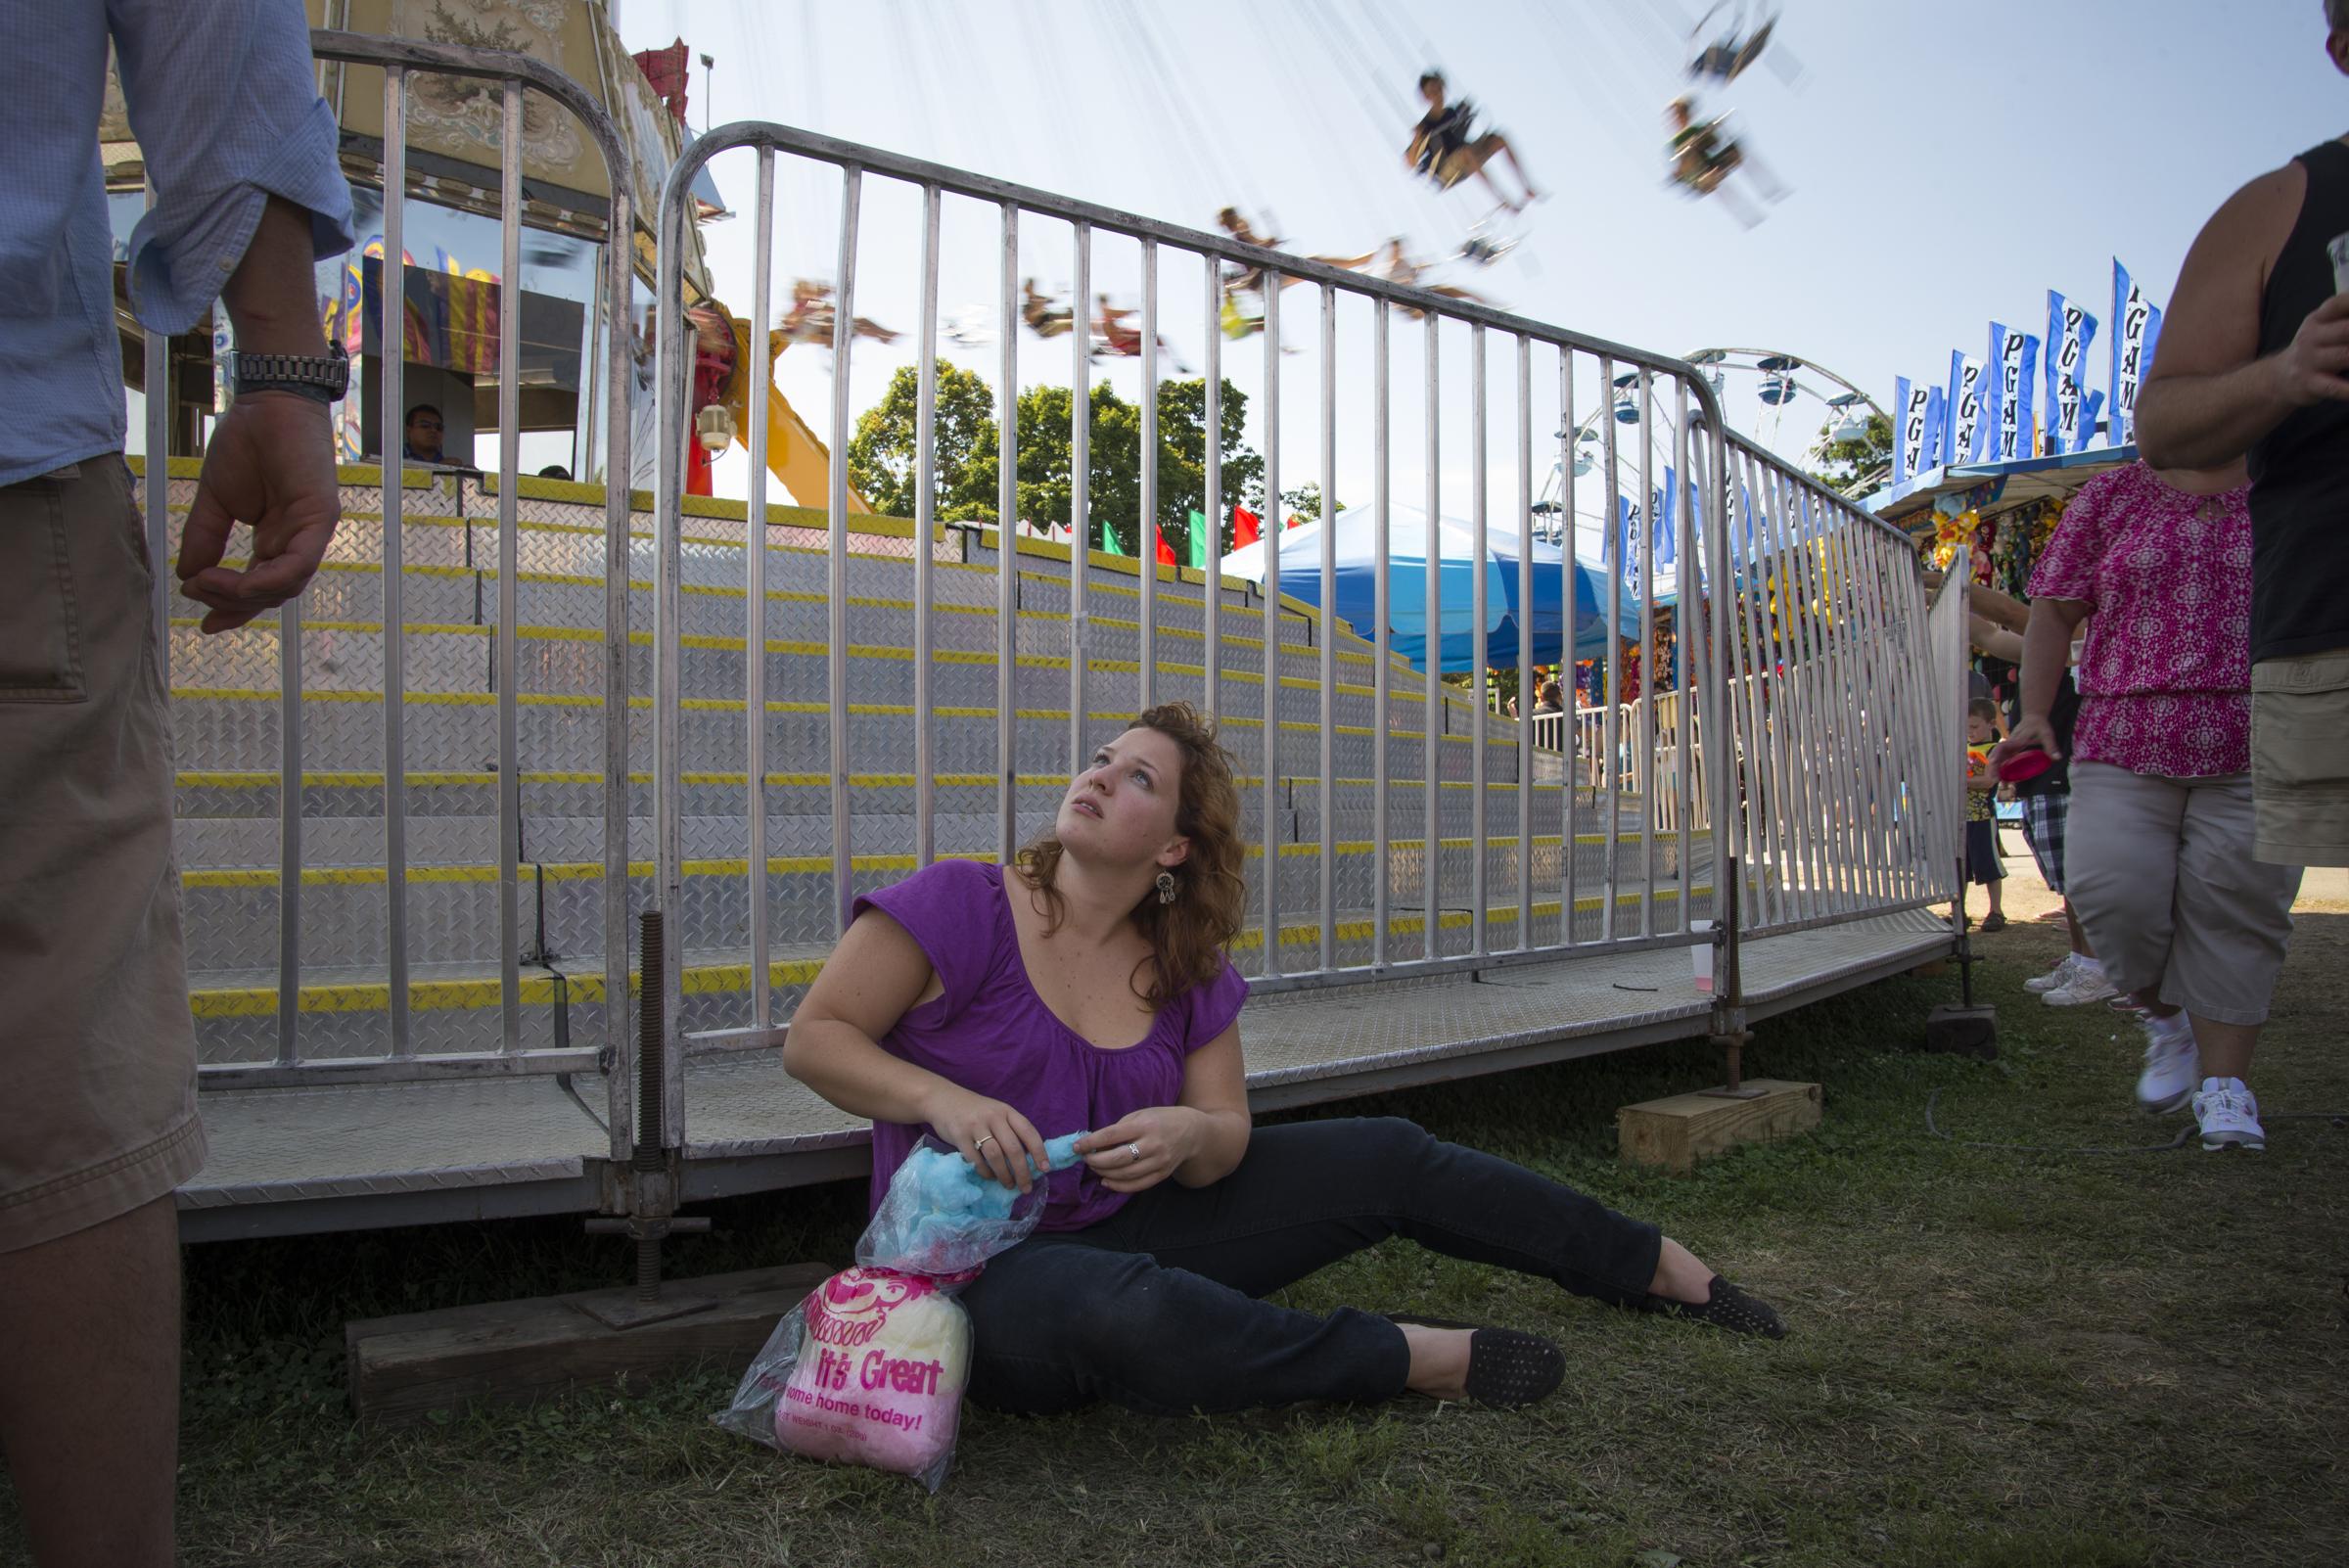 08252013-CarnivalScene-JuliaLuckettPhotography-6